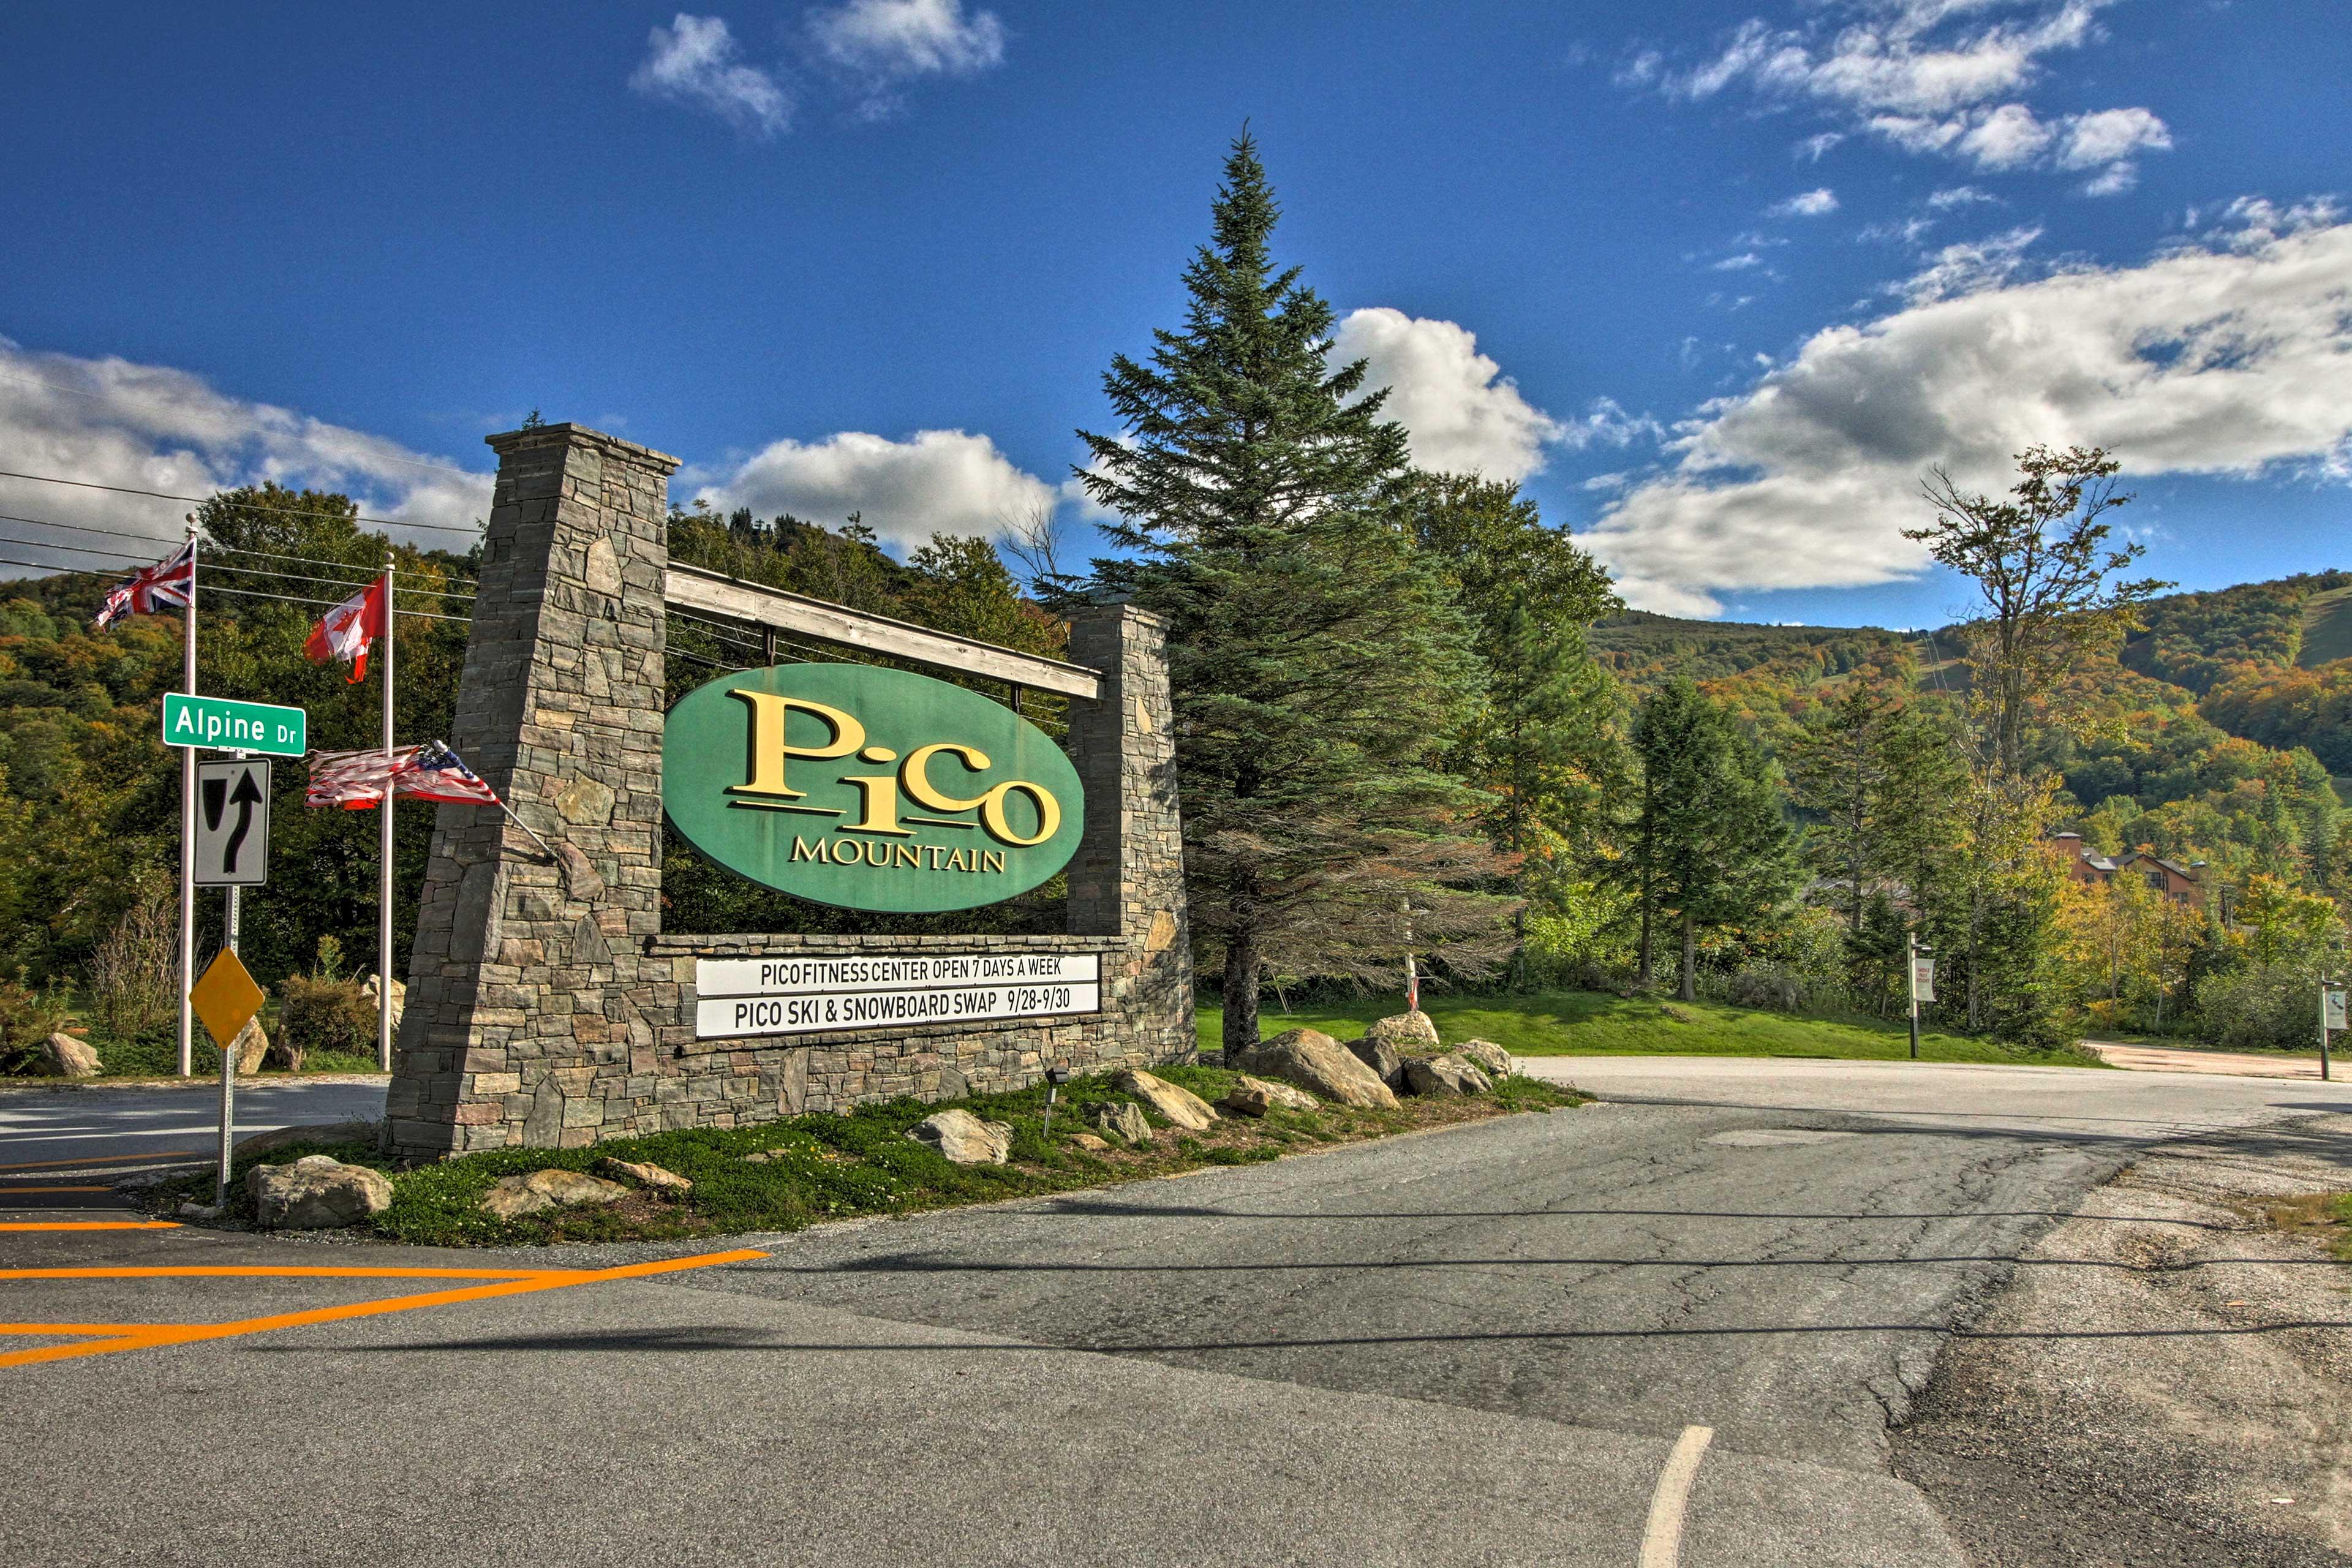 Pico Mountain Resort